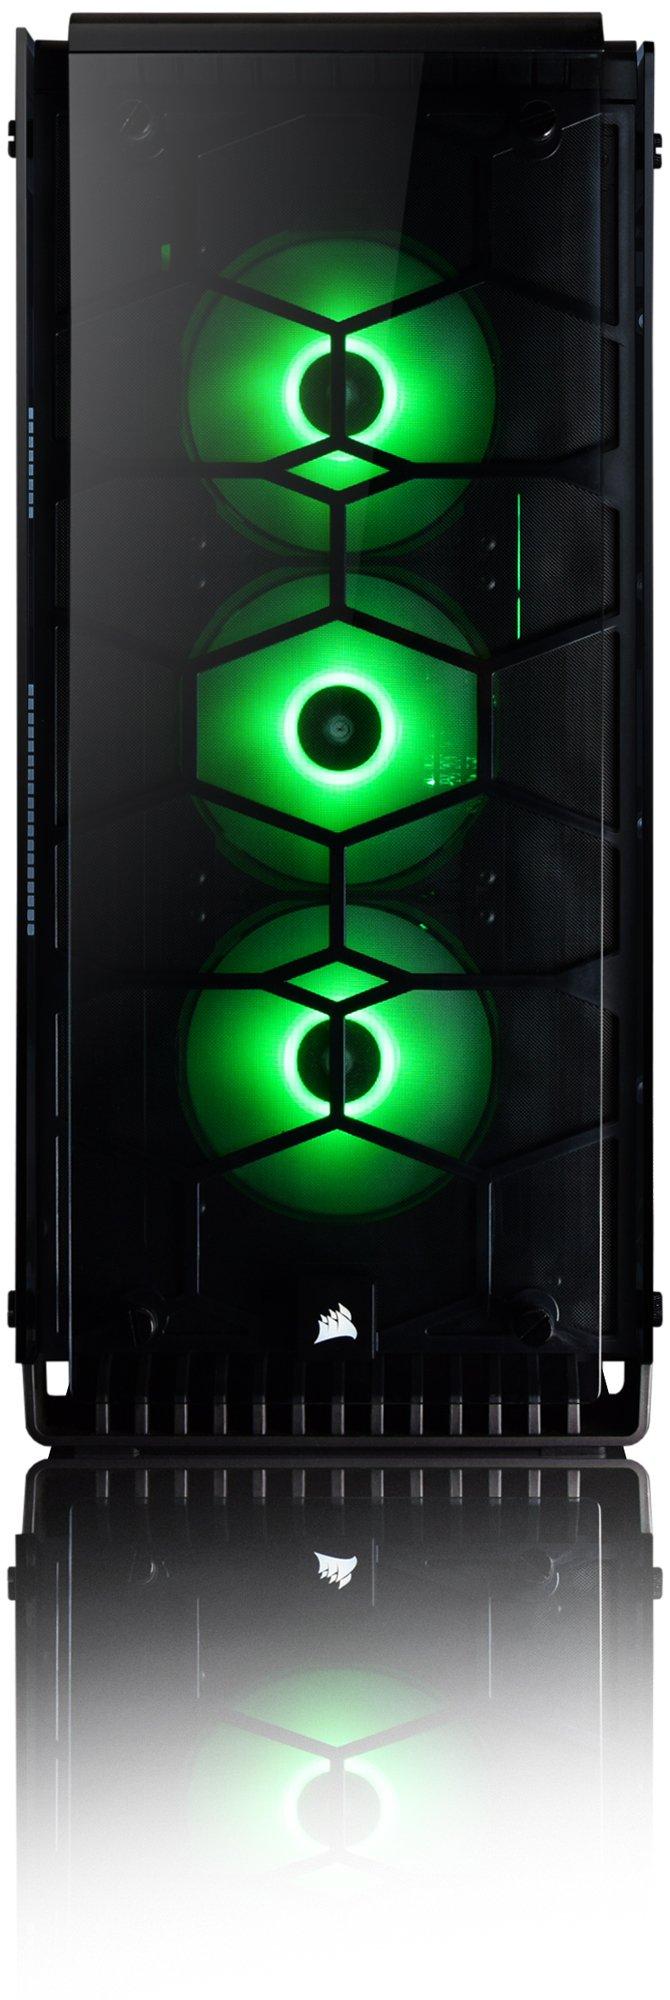 Vibox Venom GS580T-42 Gaming-PC Computer mit Spiel Bundle, Win 10 Pro, 3X Triple 24 Zoll HD Monitor (4,0GHz Ryzen Quad…